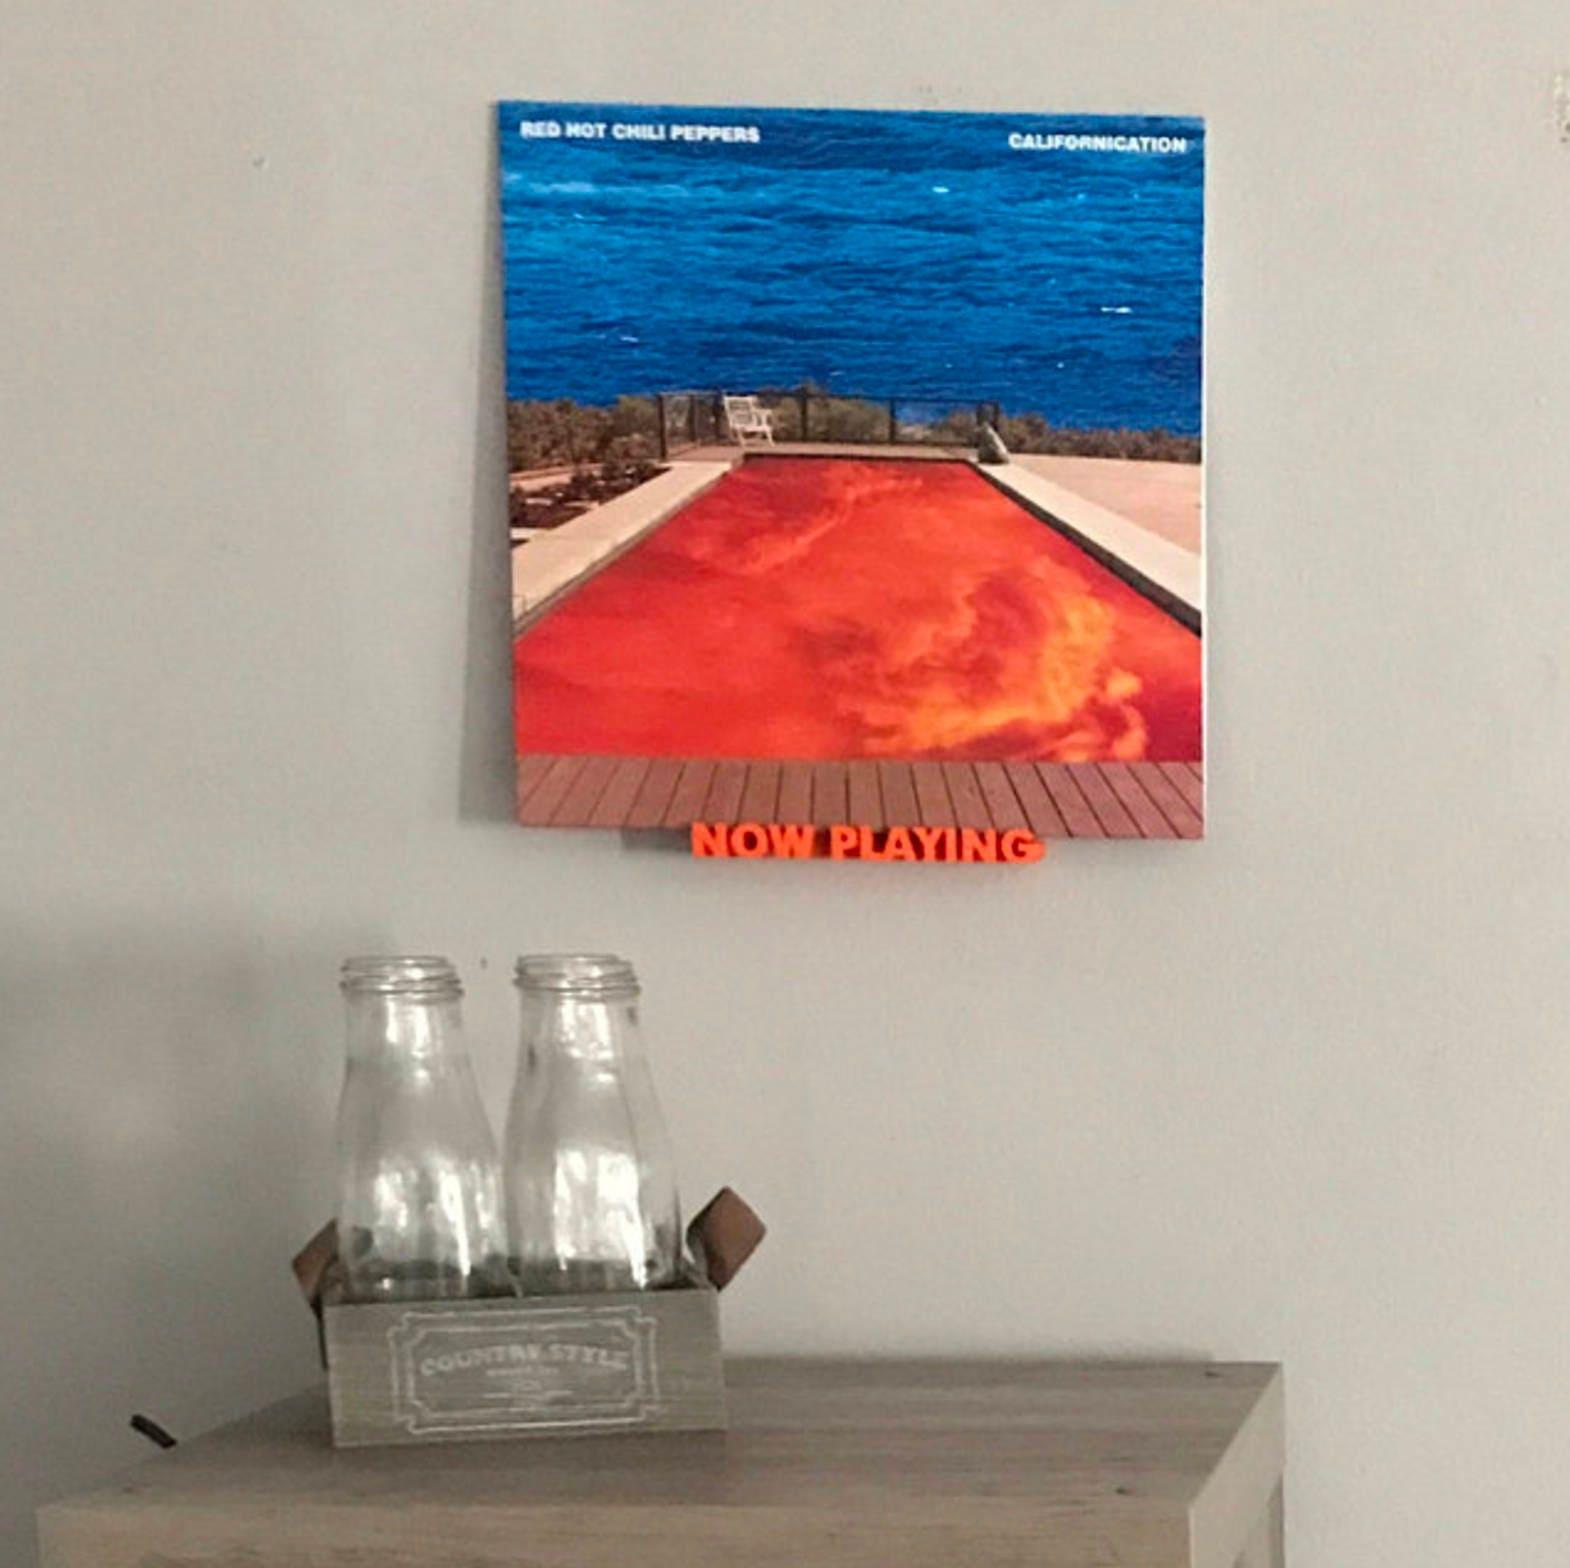 Now Playing Vinyl Record Wall Mount Display Shelf - 3D Printed Wall Art  Decor - Apartment - Vinyl Record Wall Mount Display Shelf 3D Printed Wall Art